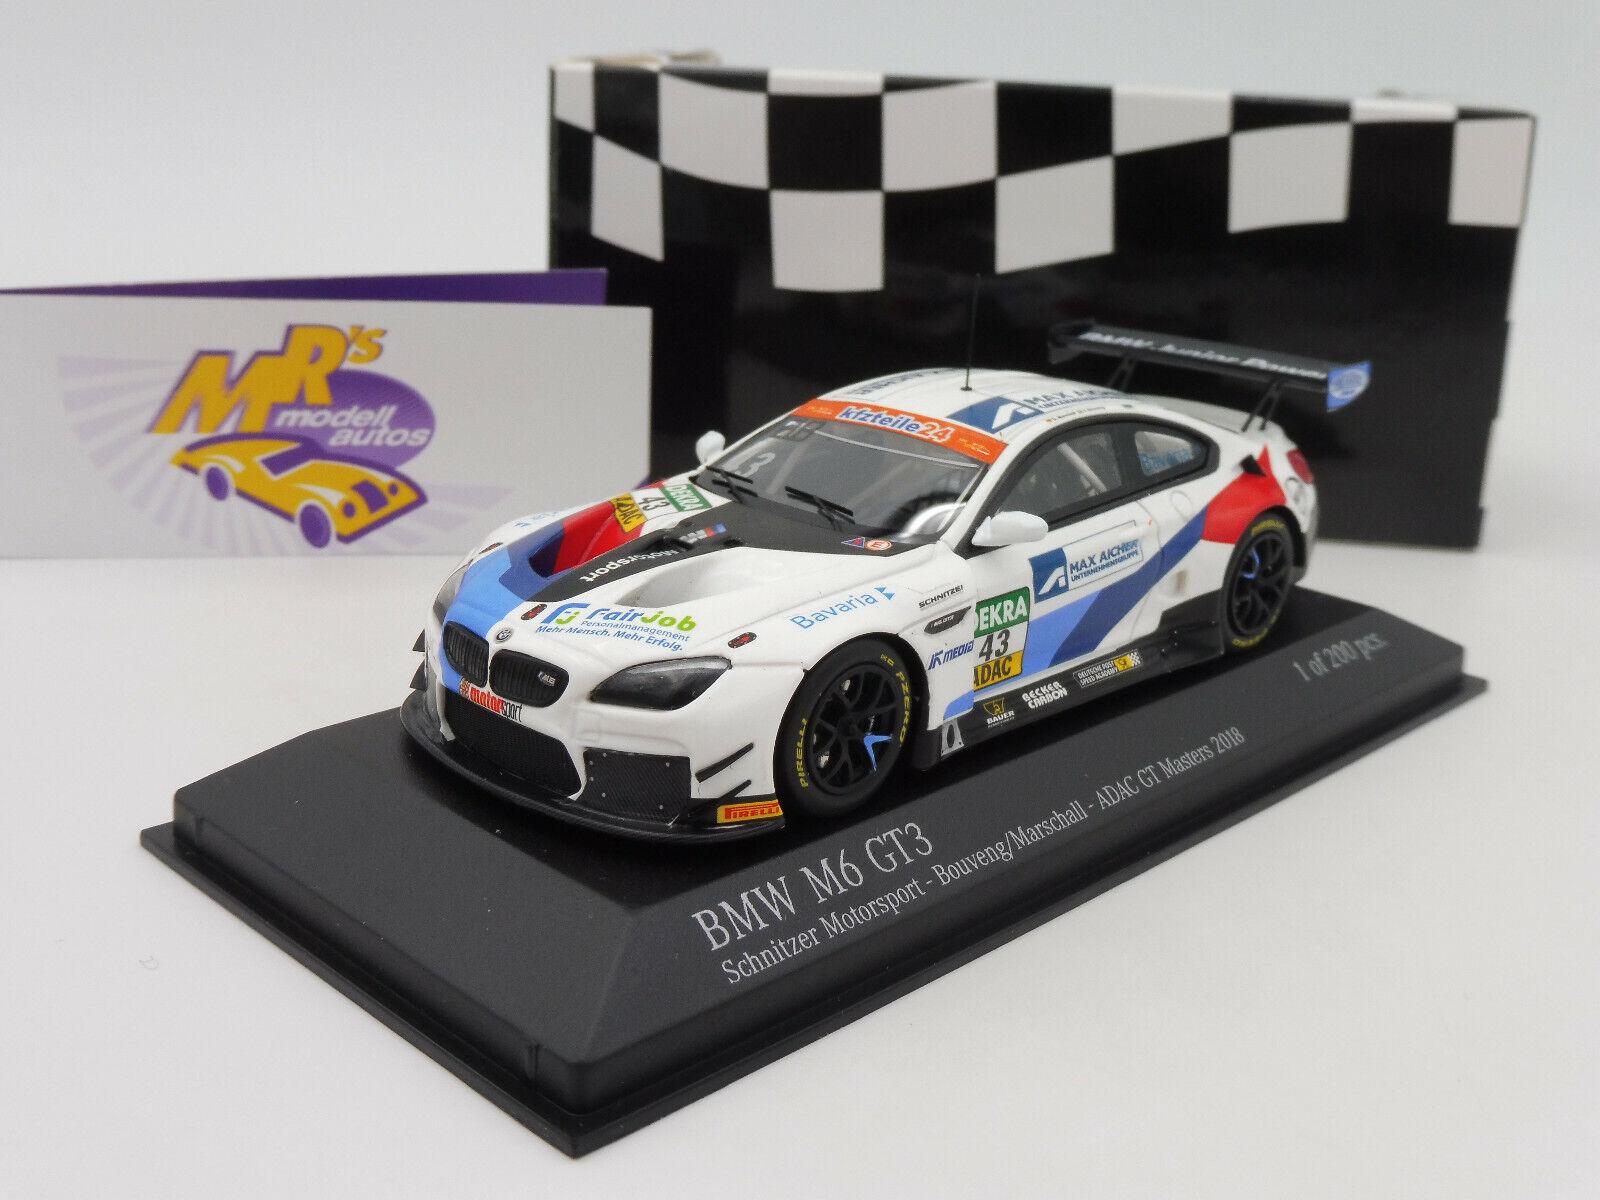 MINICHAMPS 447182643   BMW m6 gt3 ADAC GT-Masters 2018 No. 43  maréchal  1 43